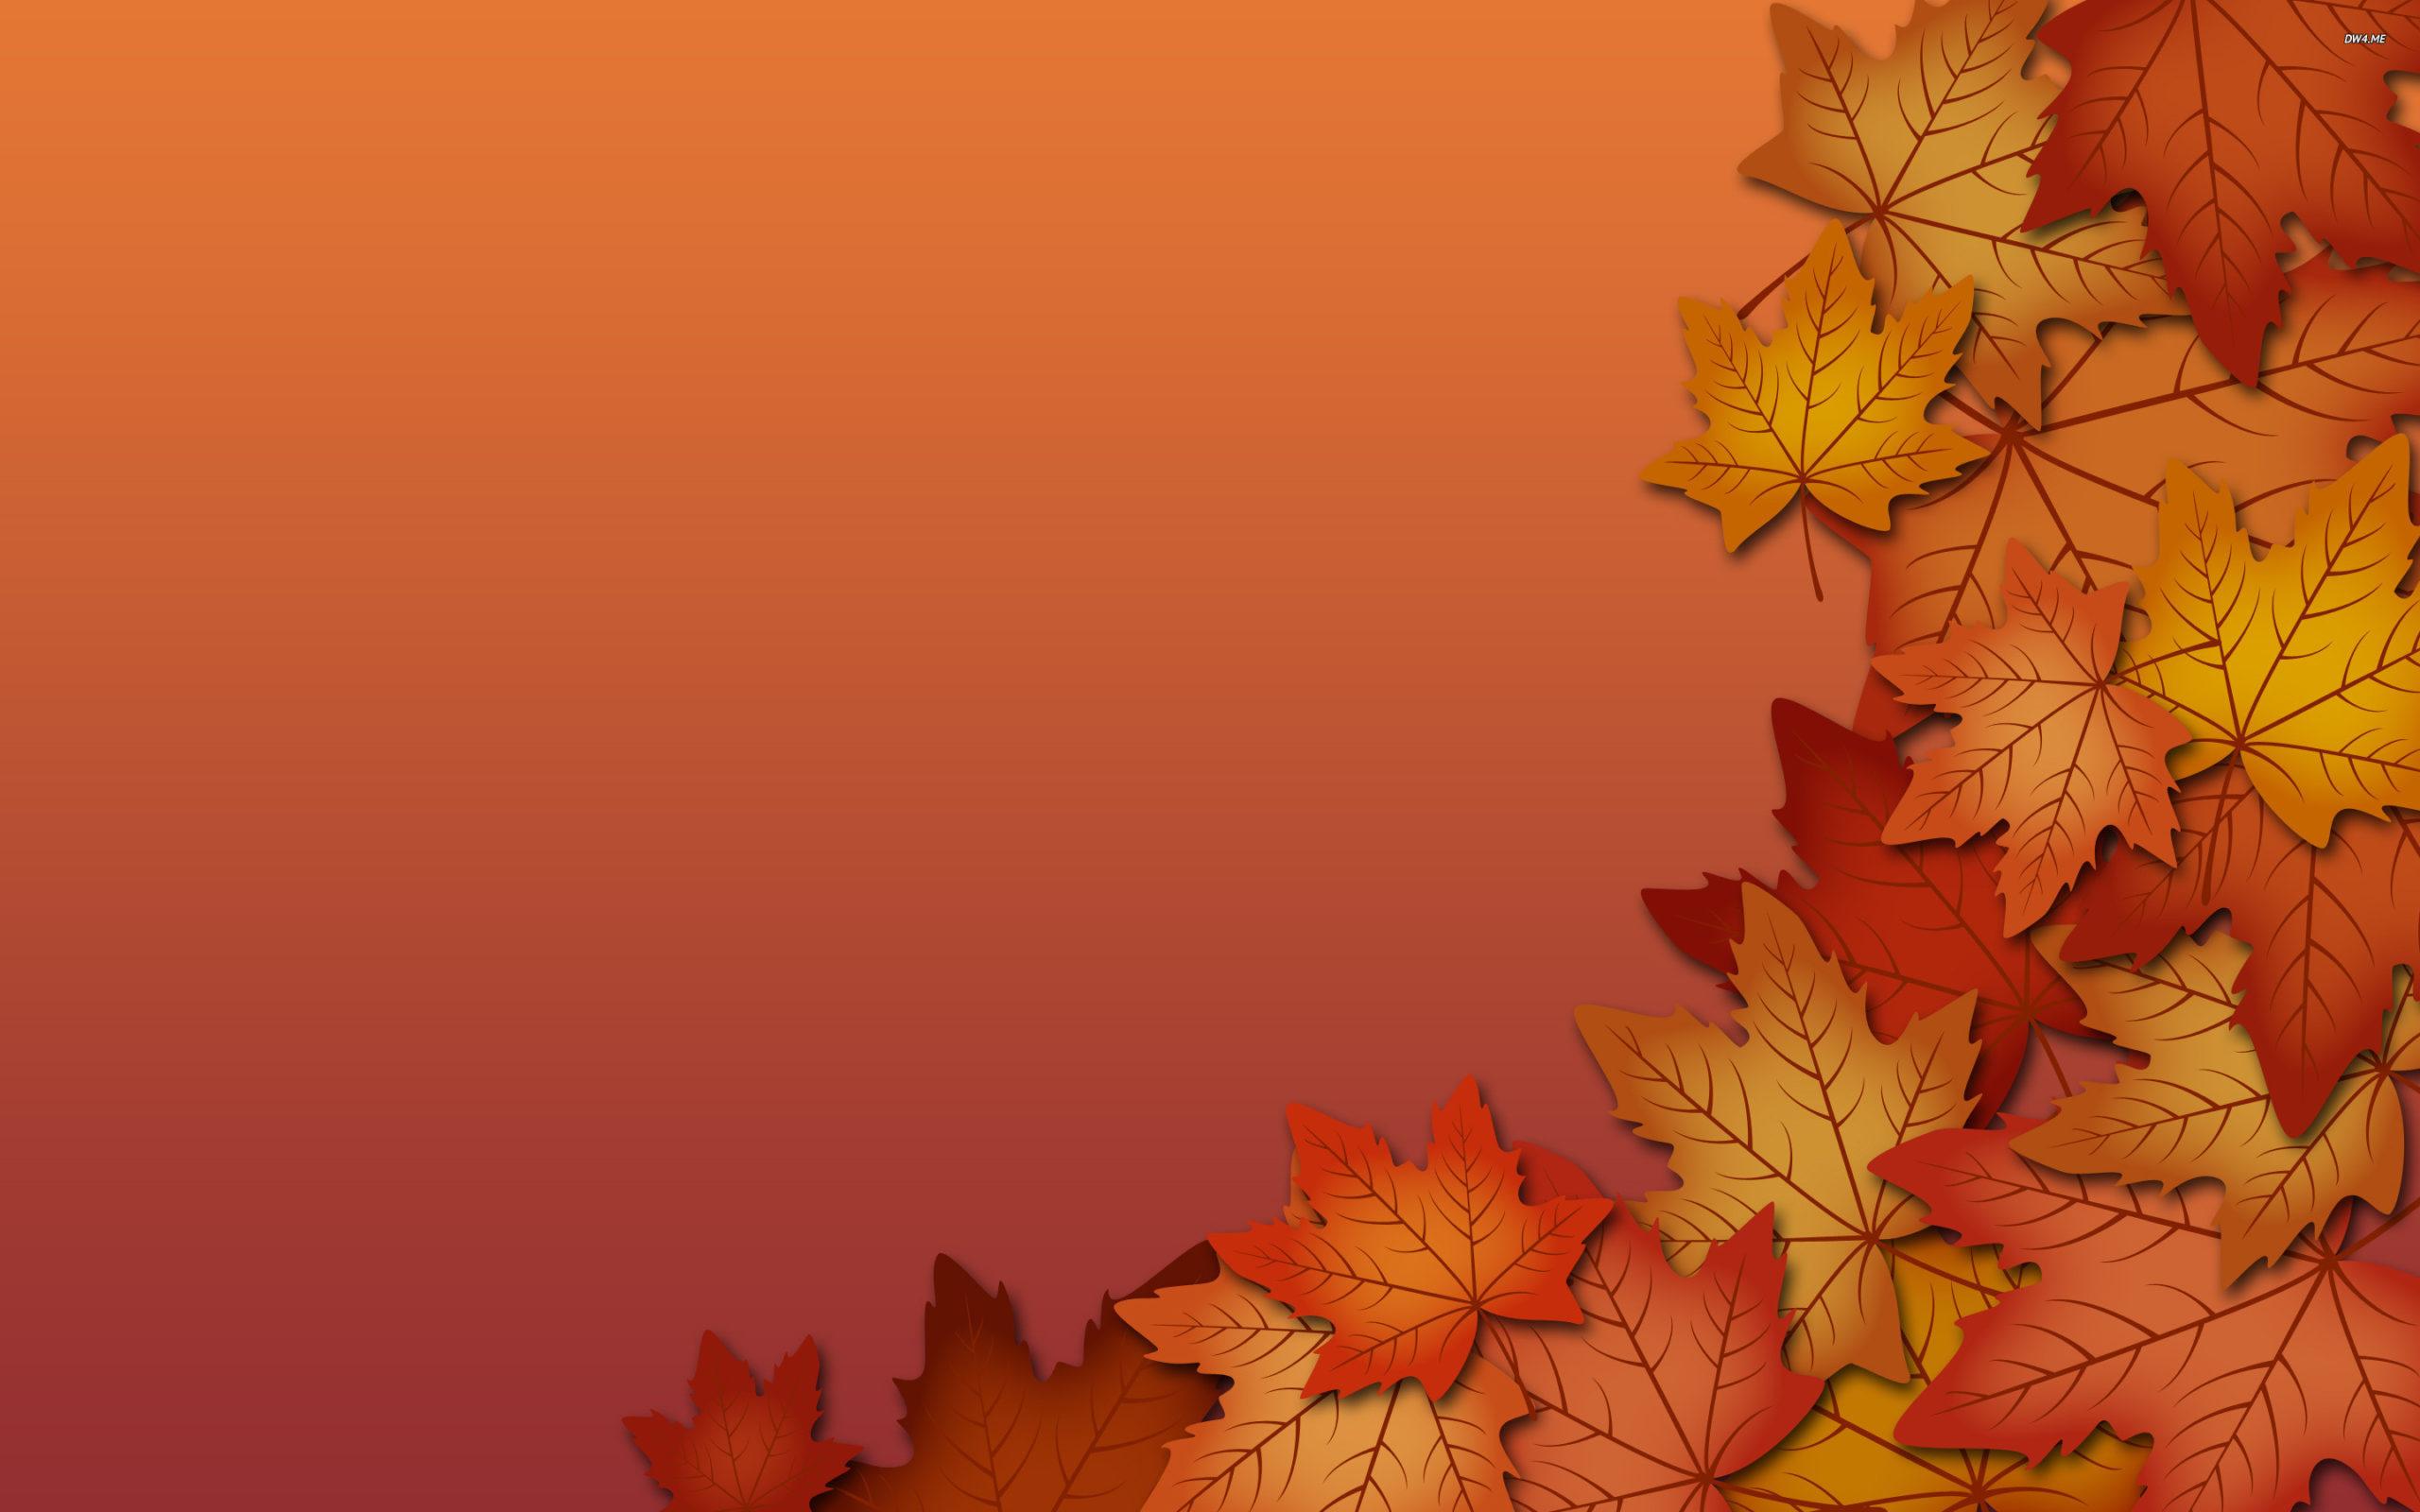 fall season wallpapers hd